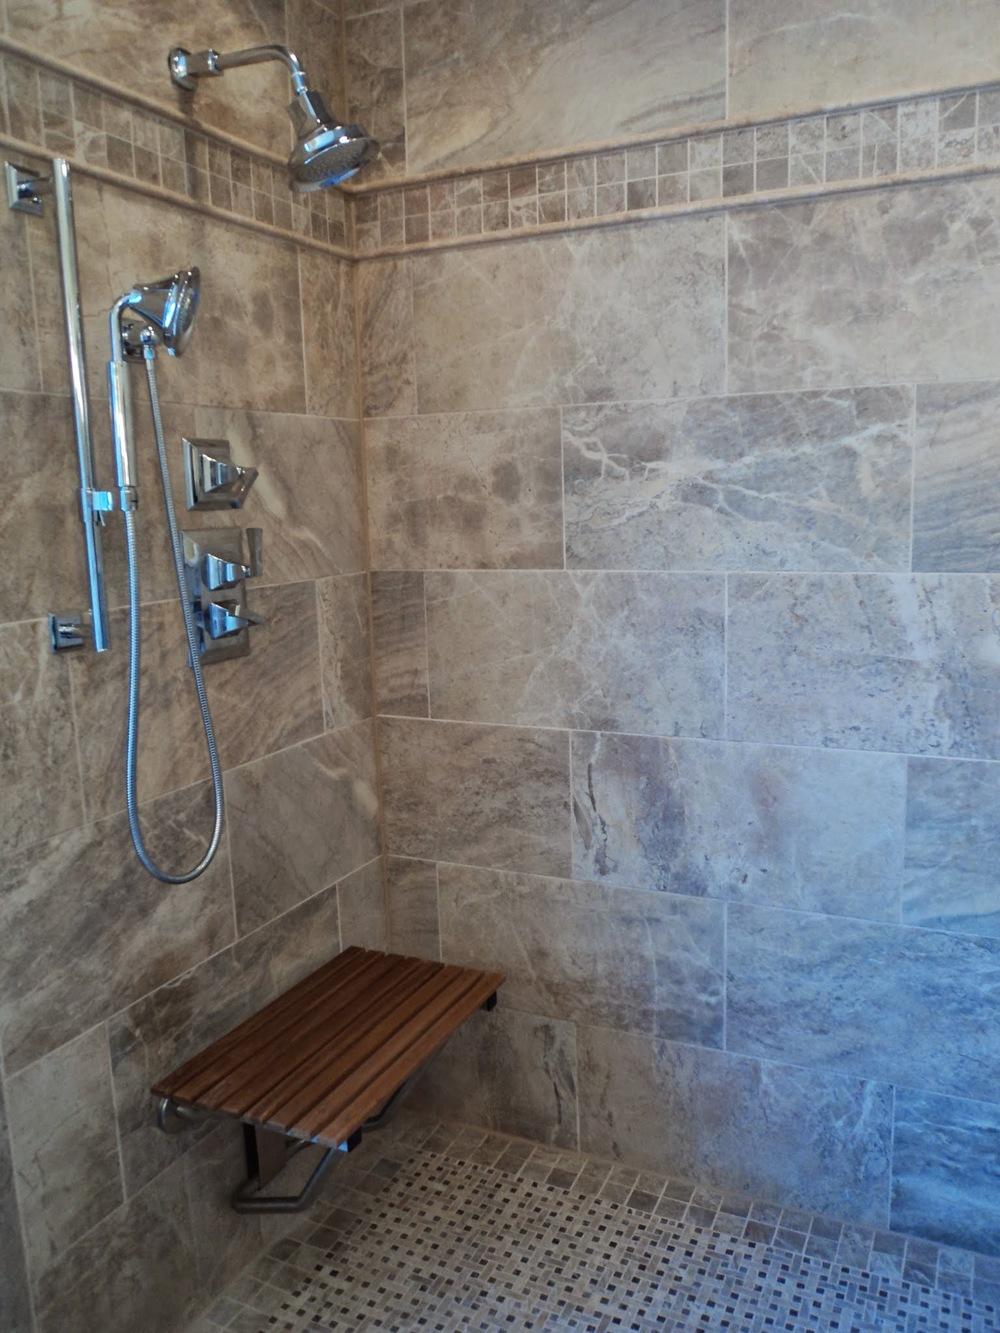 Shaw Remodeling Bathroom Design East Lyme CT (4).JPG